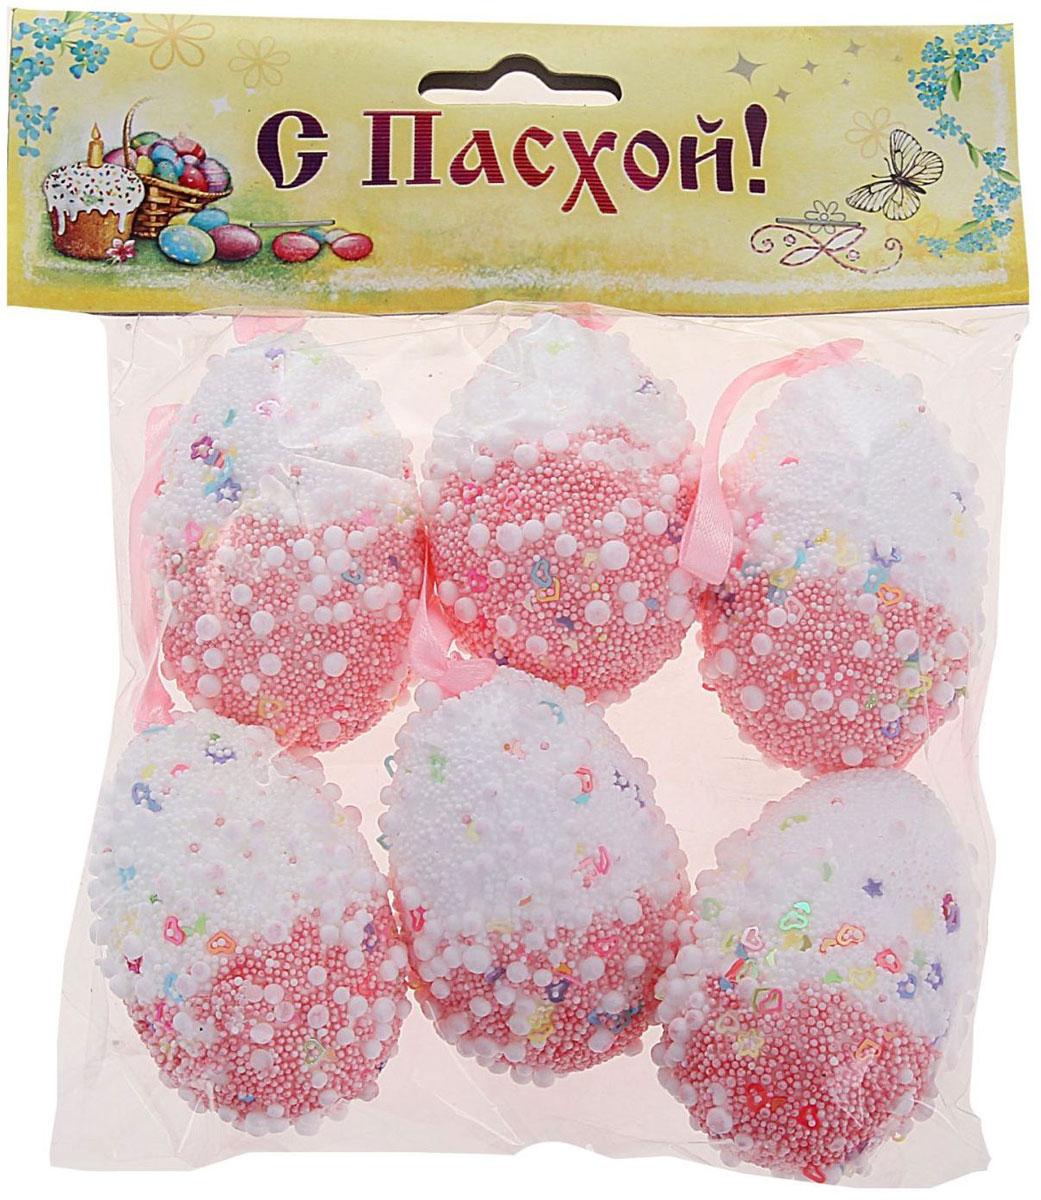 Набор пасхальных подвесных украшений Sima-land Яйцо. Посыпка, 4 х 4 х 6 см, 6 шт сувенир пасхальный sima land яйцо горошек 4 х 4 х 6 см 6 шт